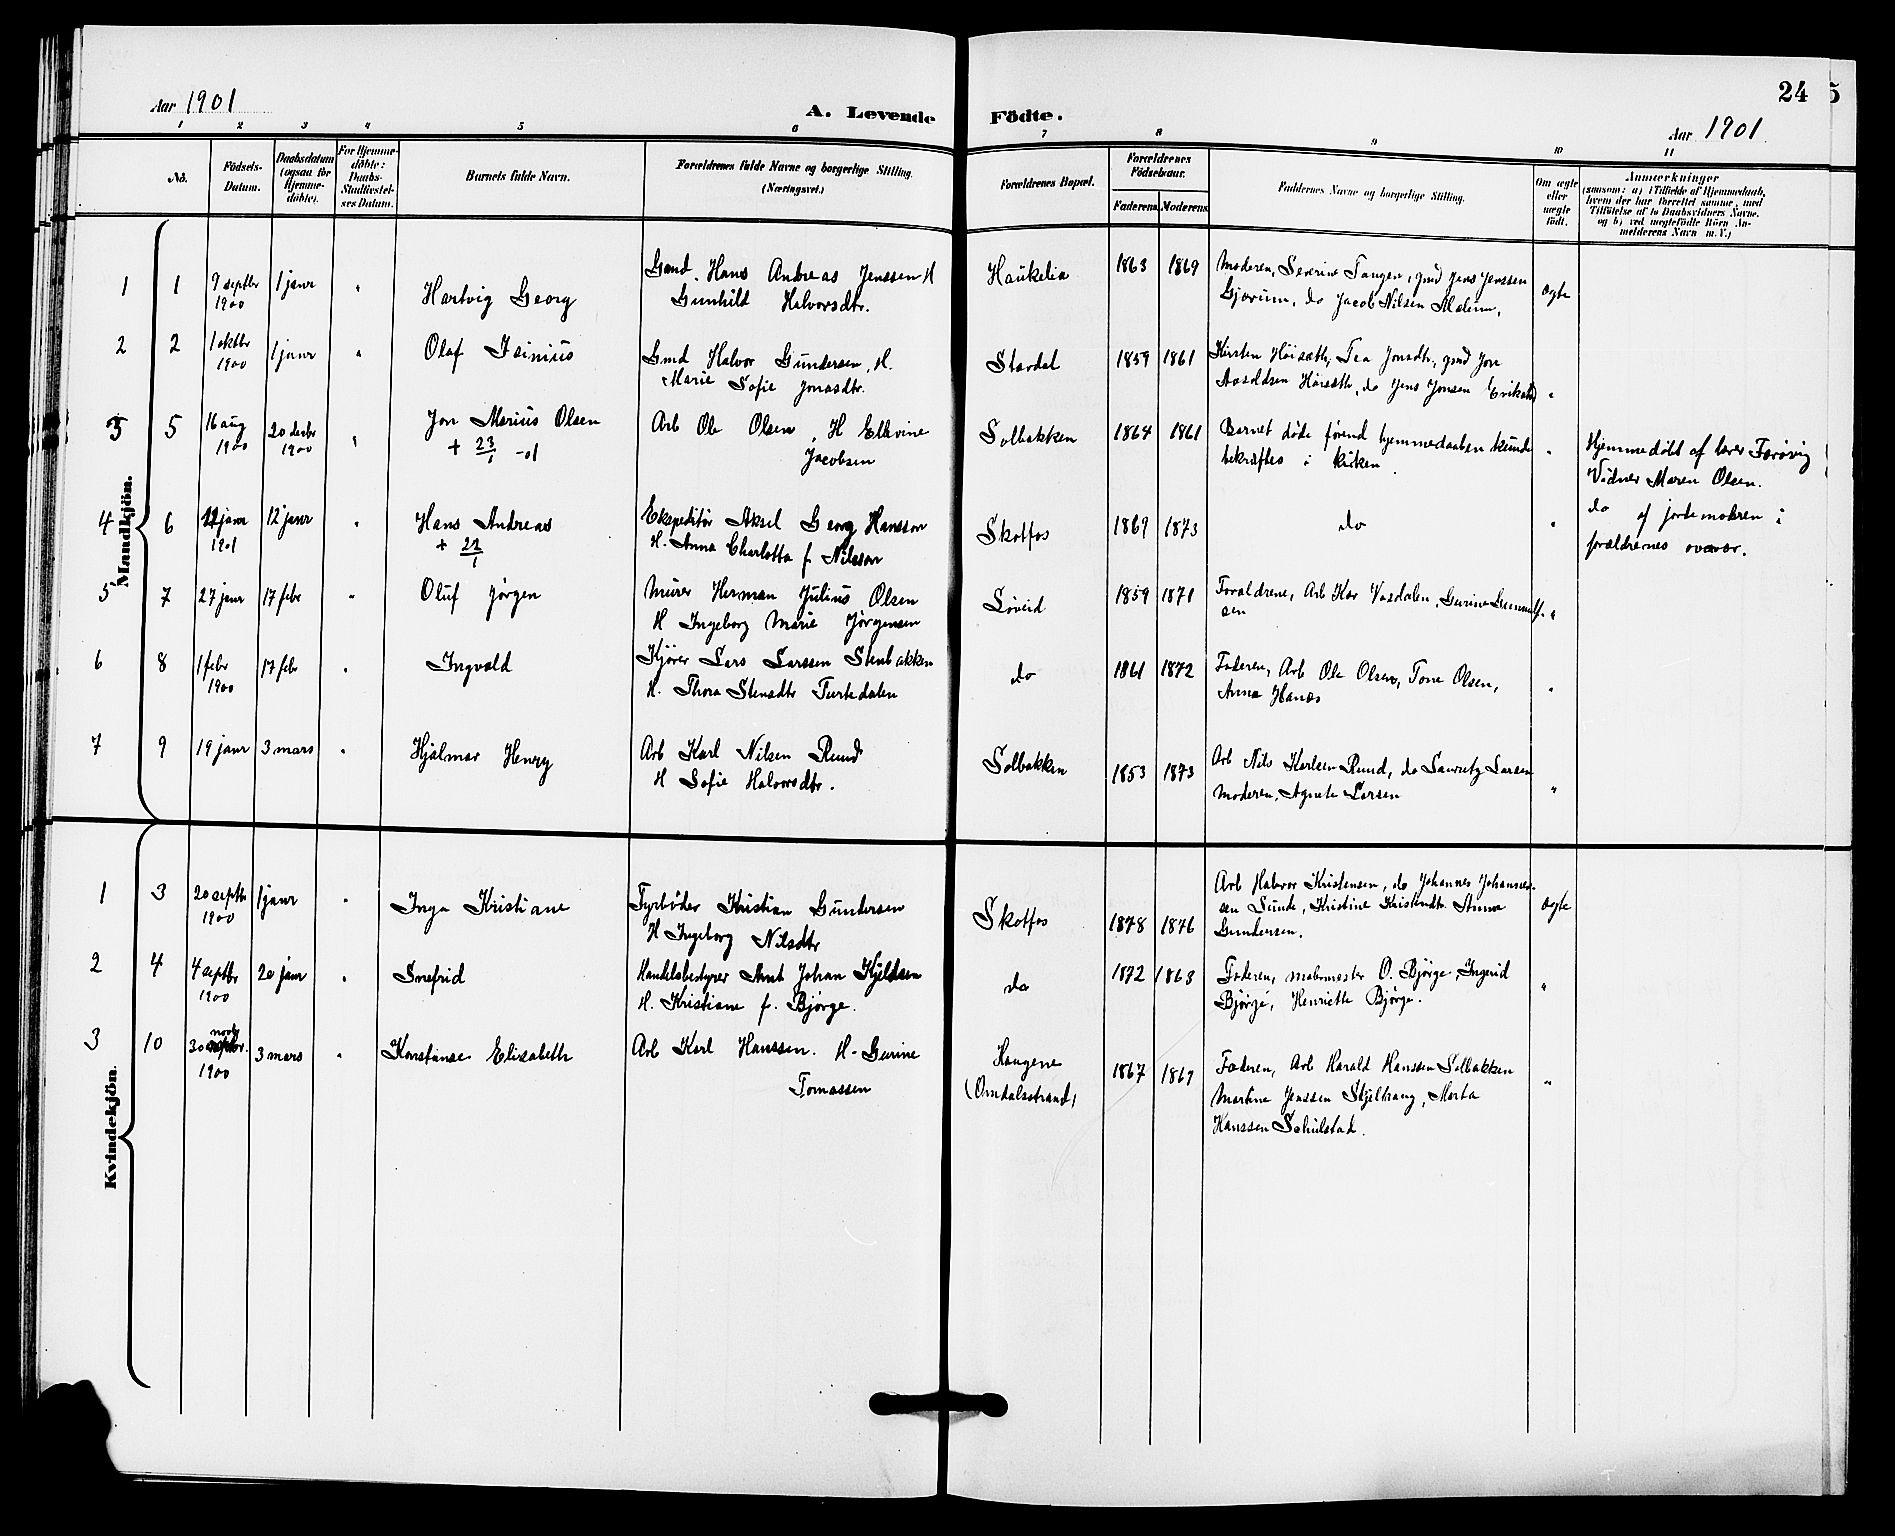 SAKO, Solum kirkebøker, G/Gb/L0004: Klokkerbok nr. II 4, 1898-1905, s. 24